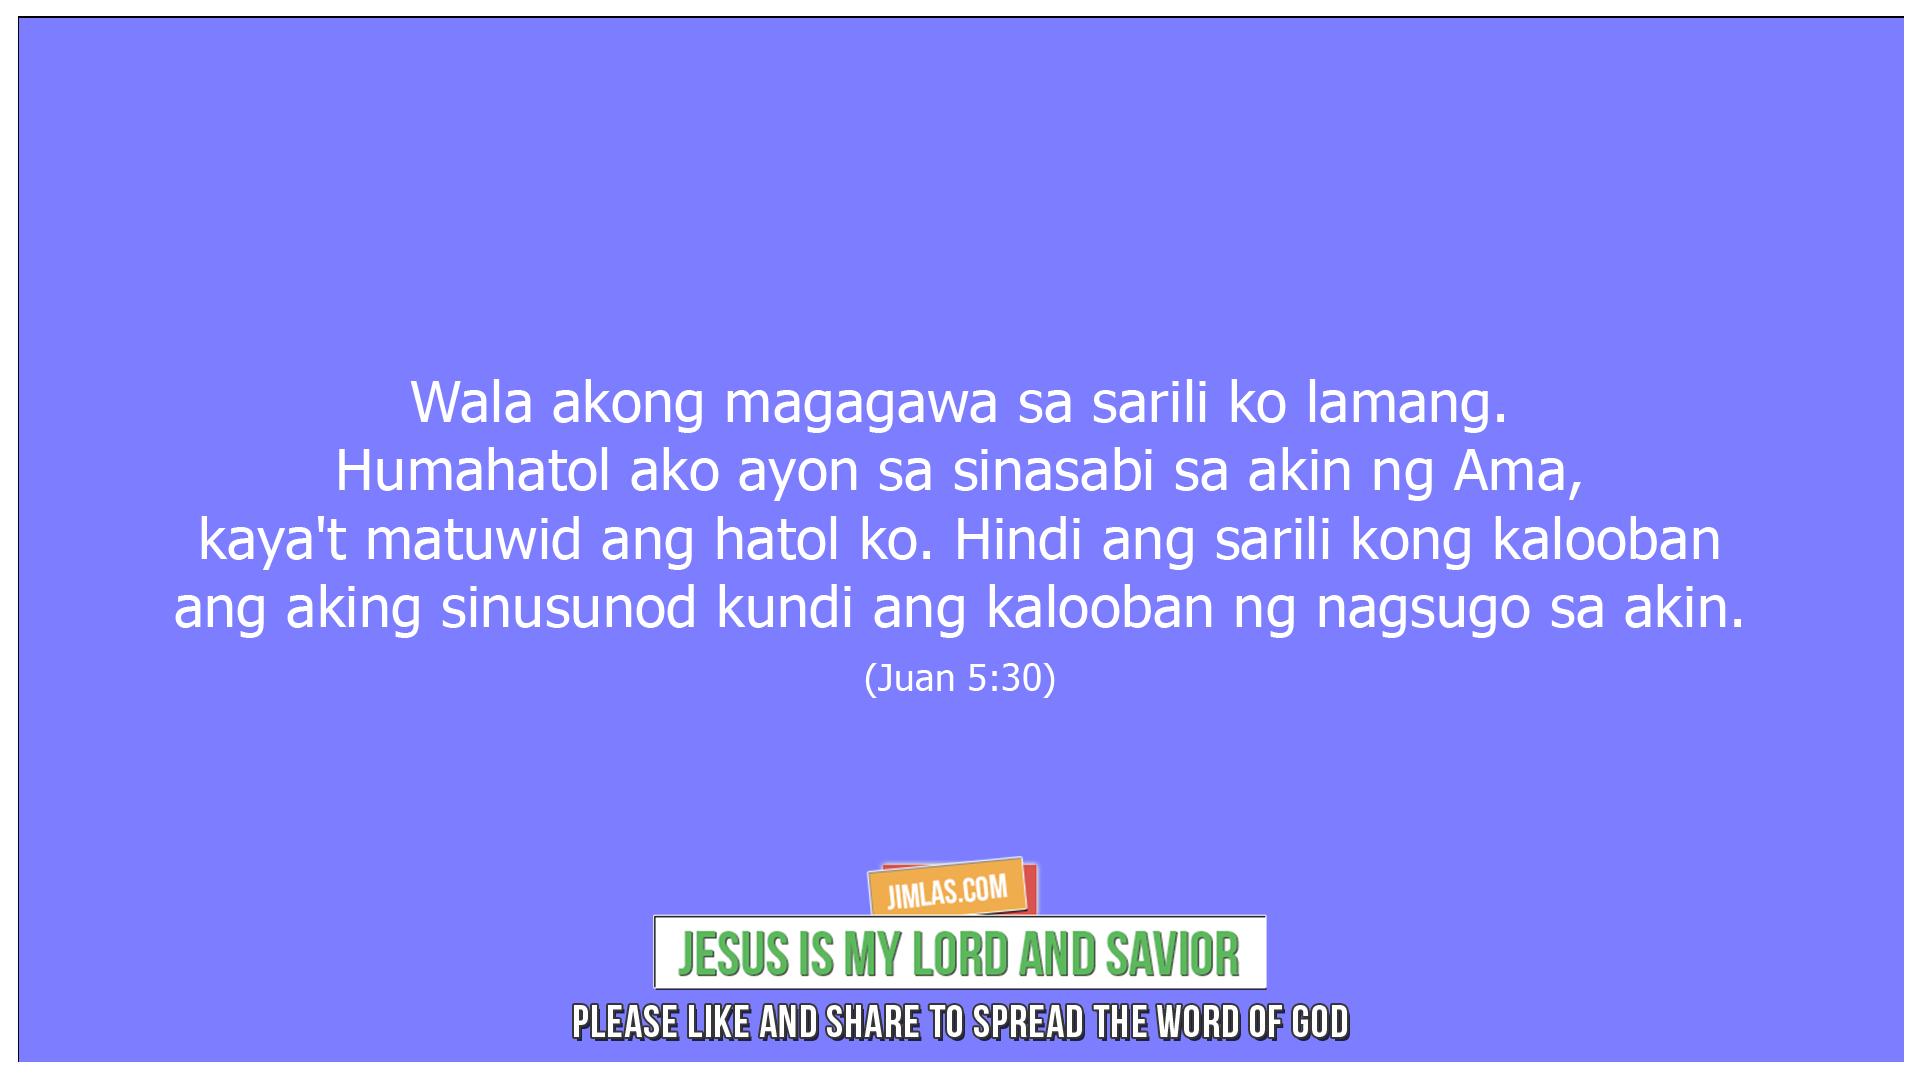 Juan 5 30, Juan 5:30